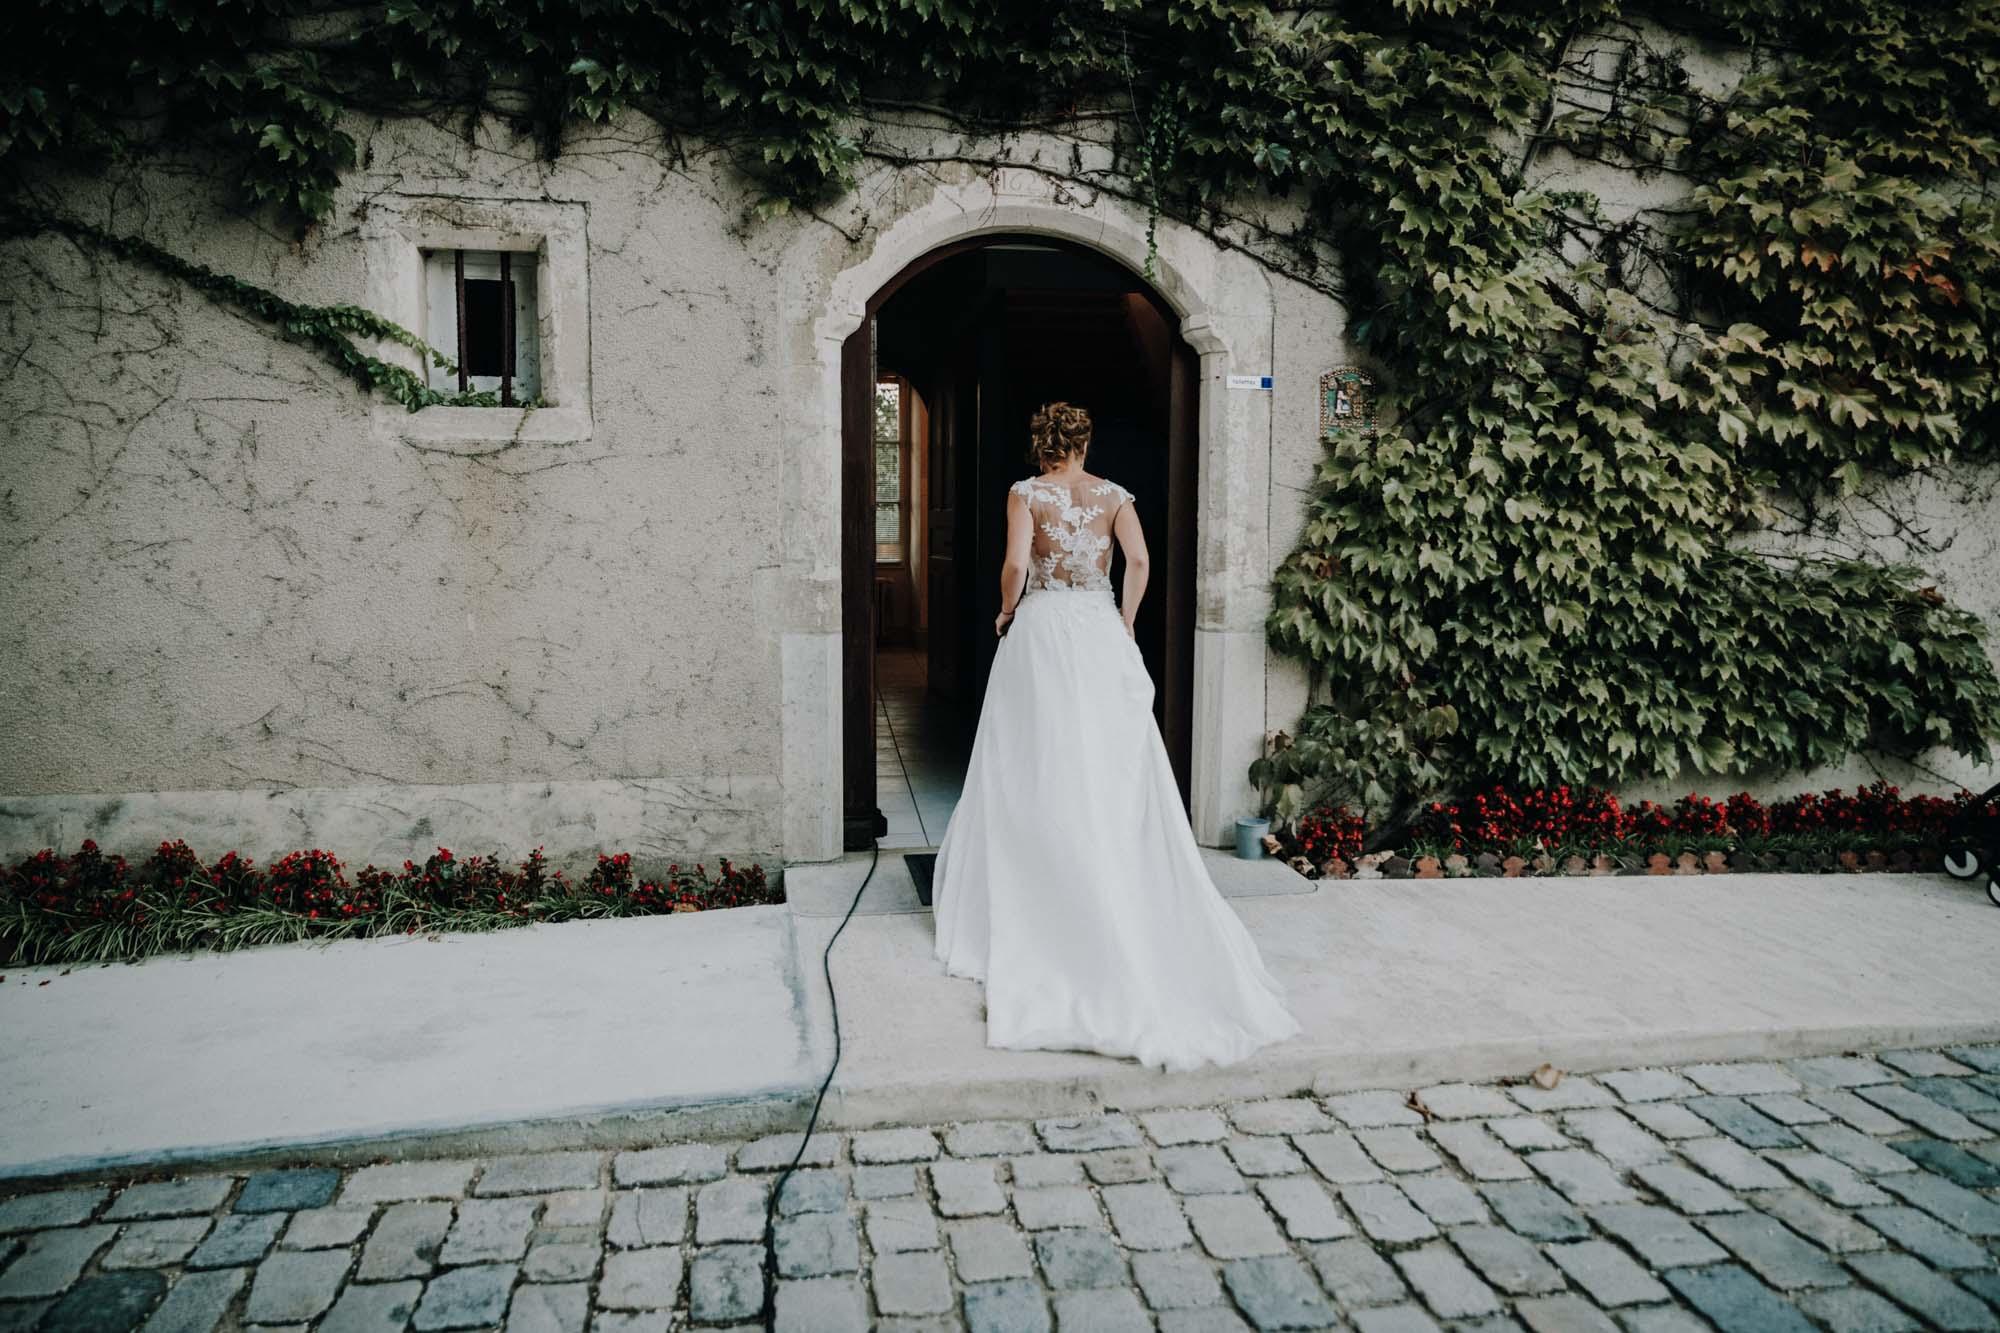 2018-09-29 - LD8_1735 - photographe mariage lyon - laurie diaz - www.lauriediazweeding.com.jpg